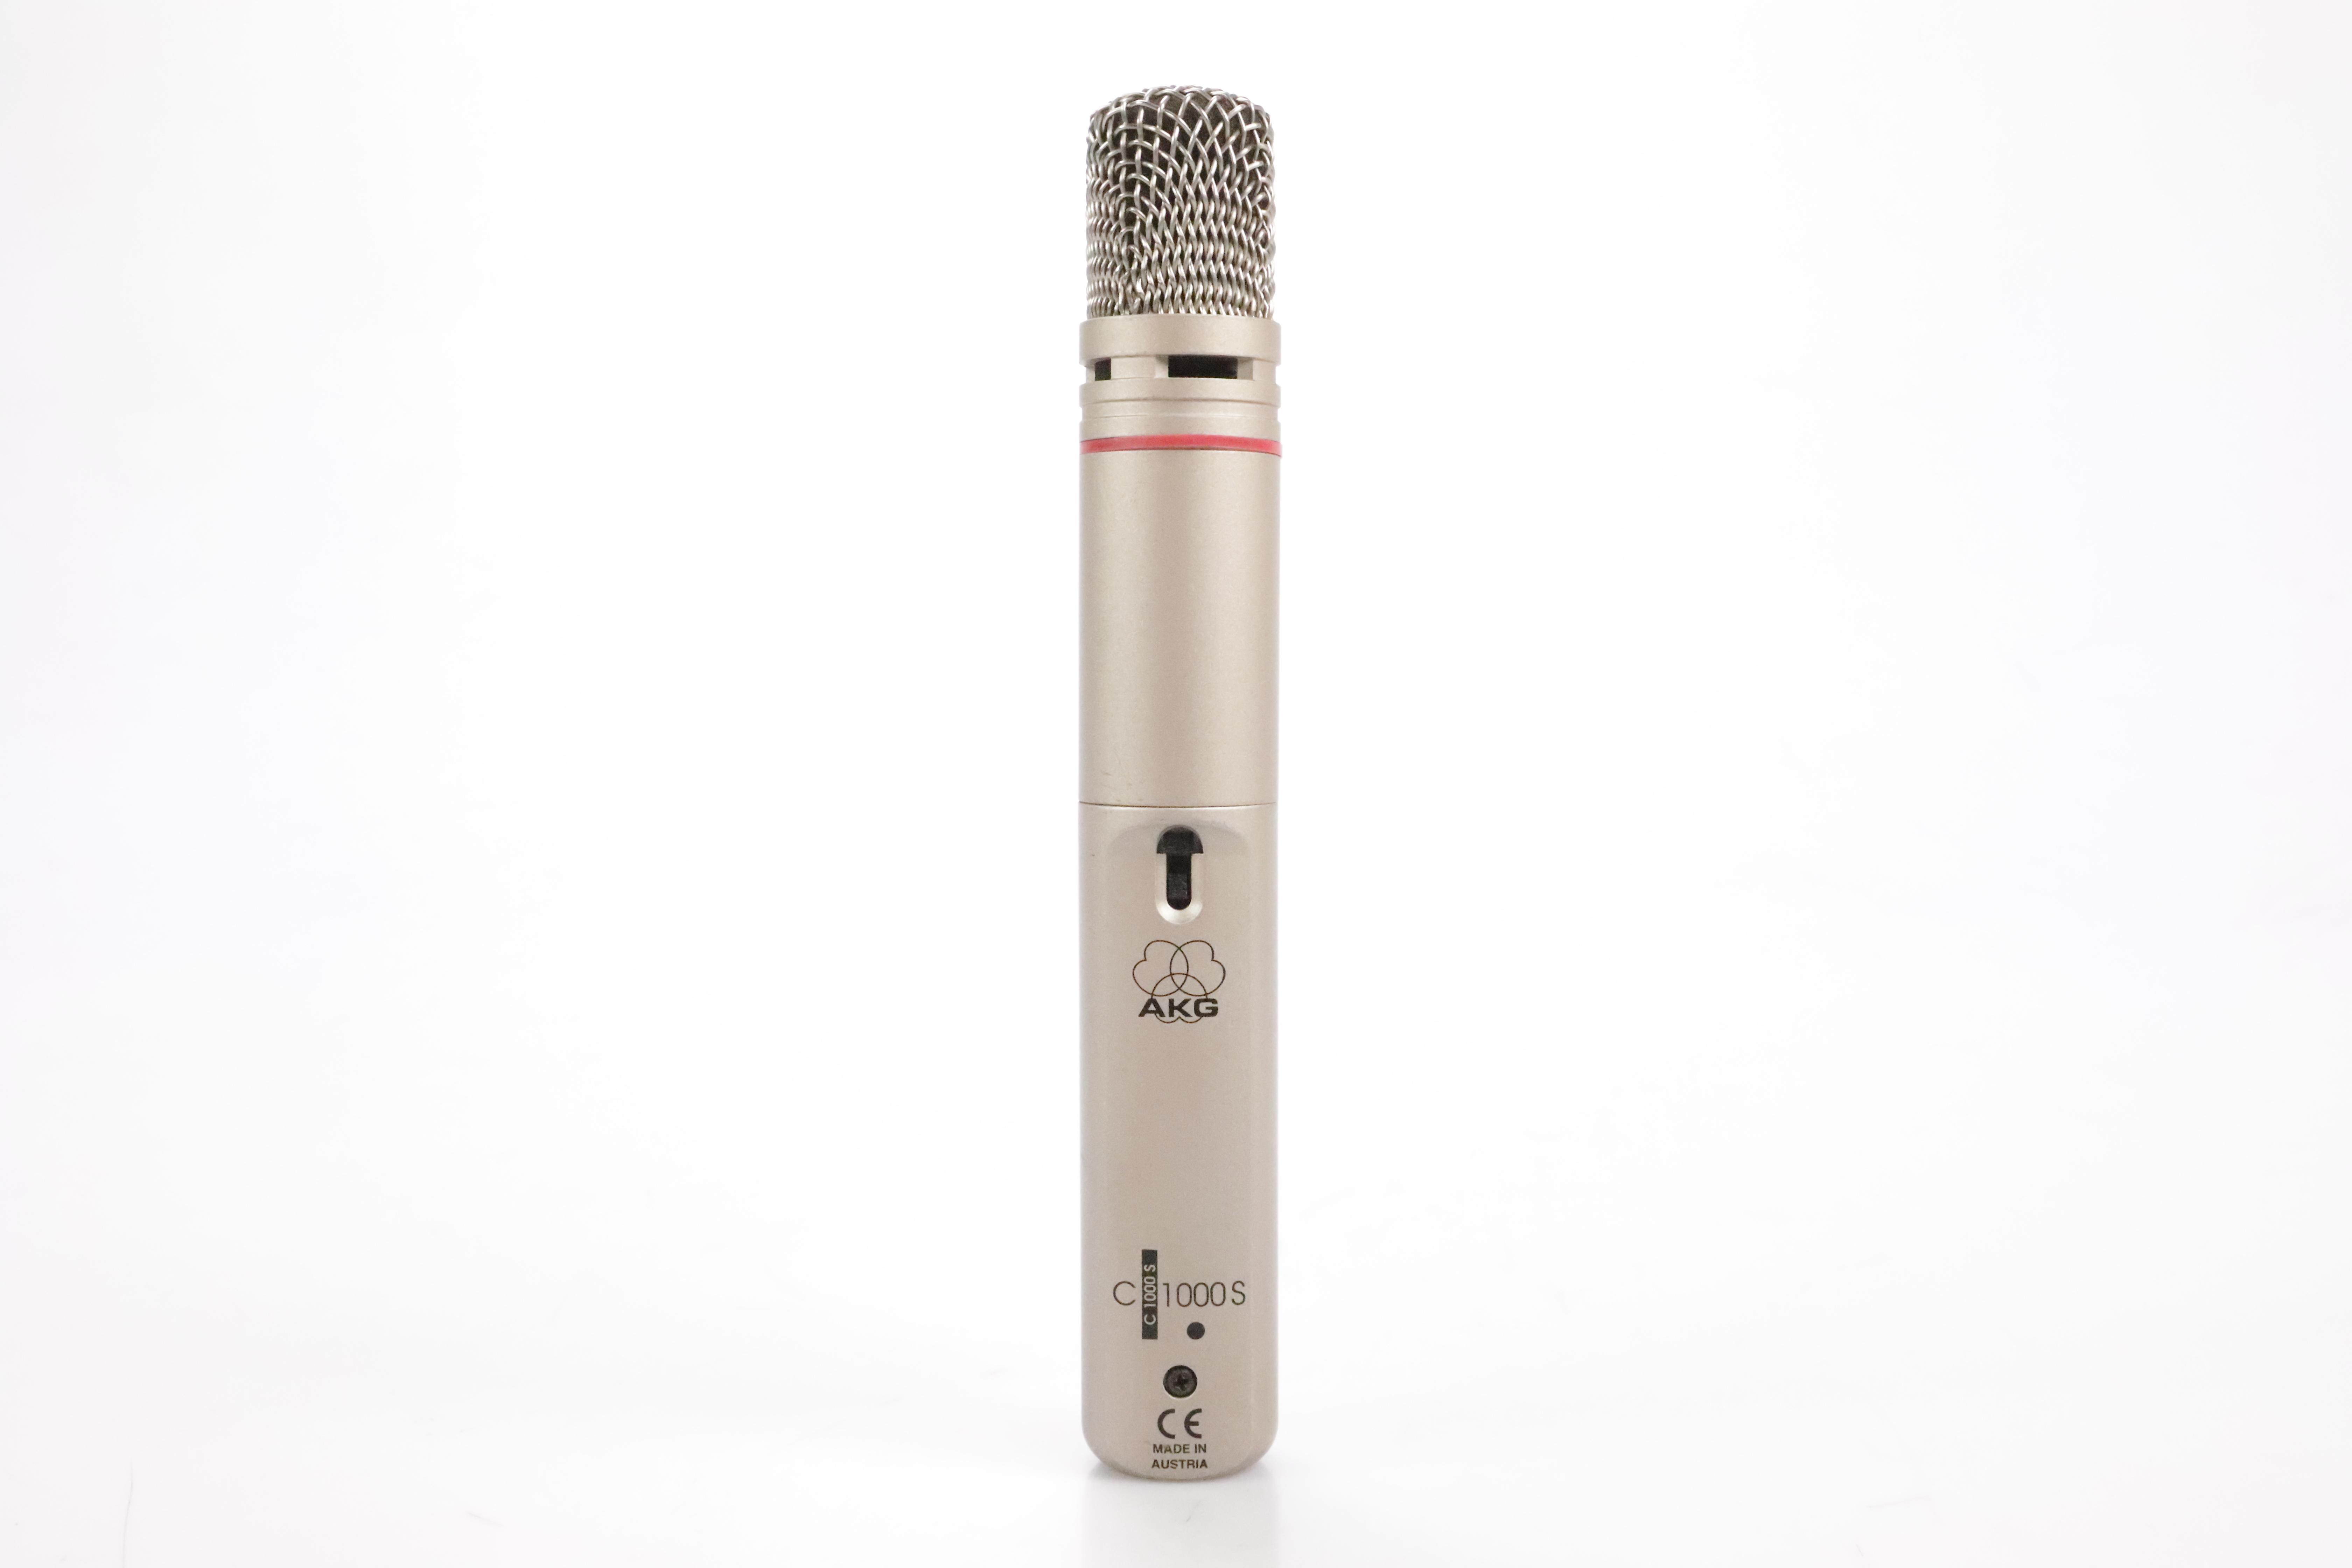 AKG C 1000S Cardioid Condenser Microphone C1000S C 1000 S Mic #34806